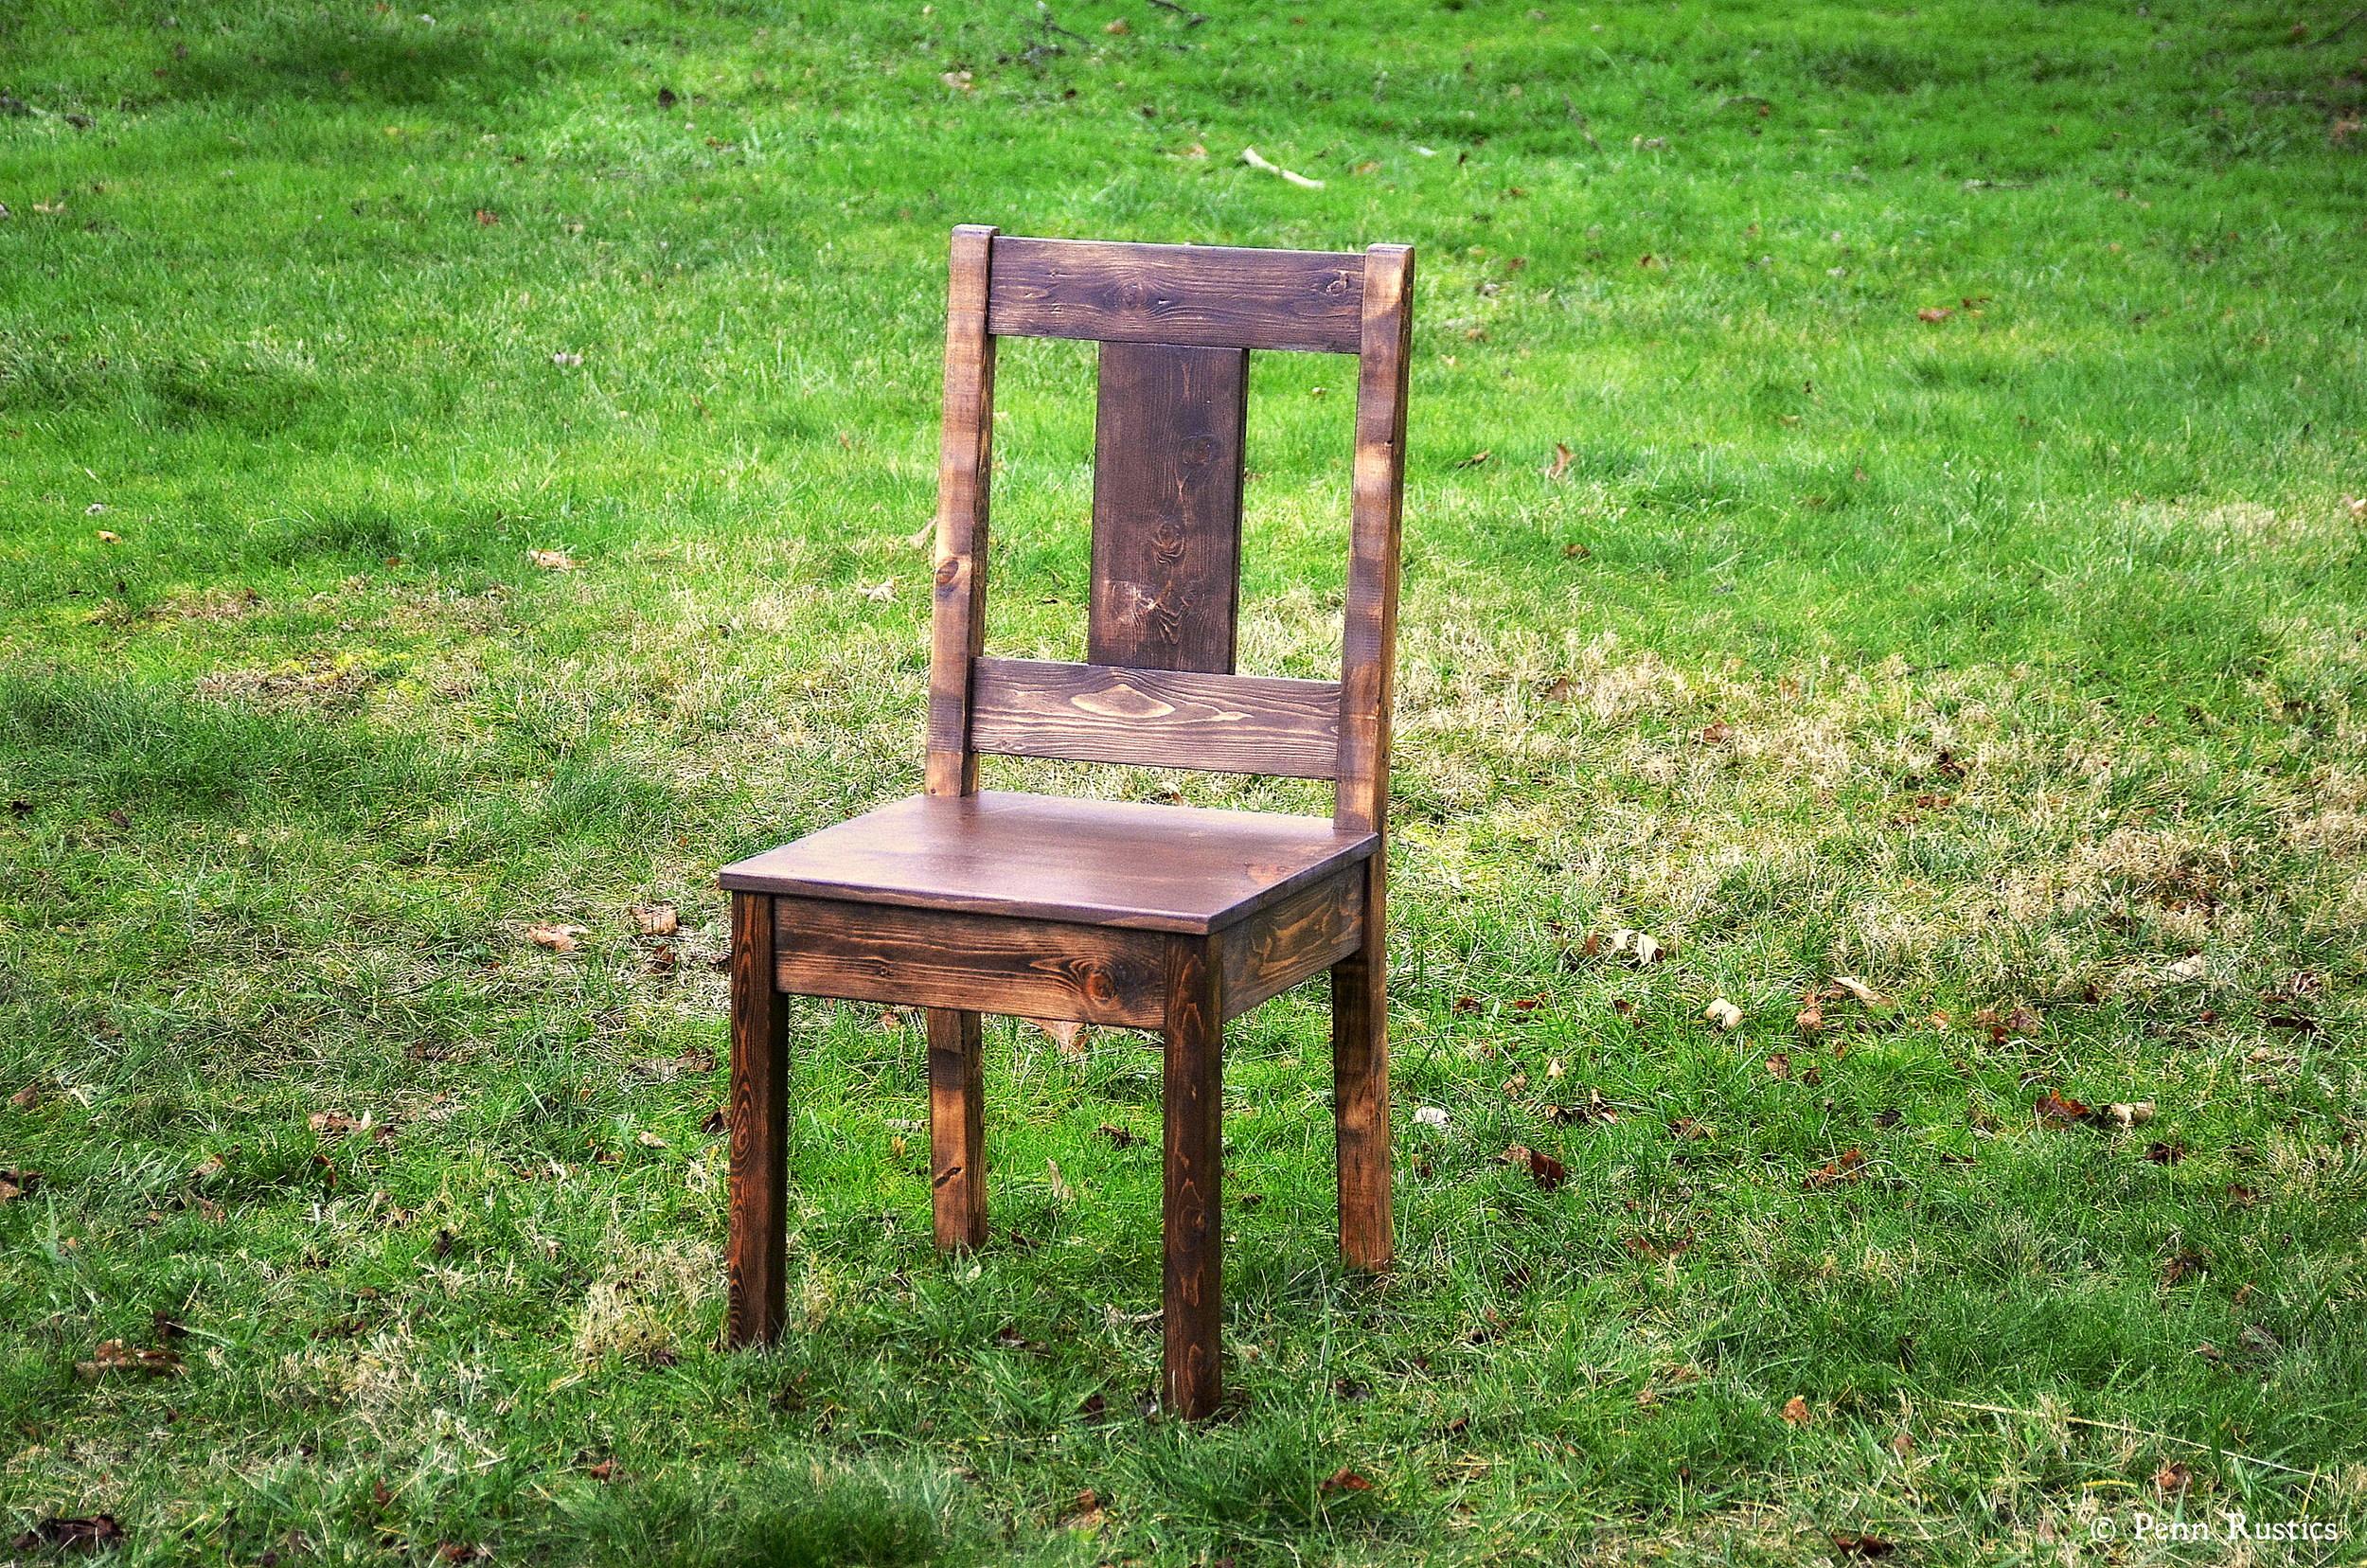 Penn Rustics_Modern Rustic Chair.jpg